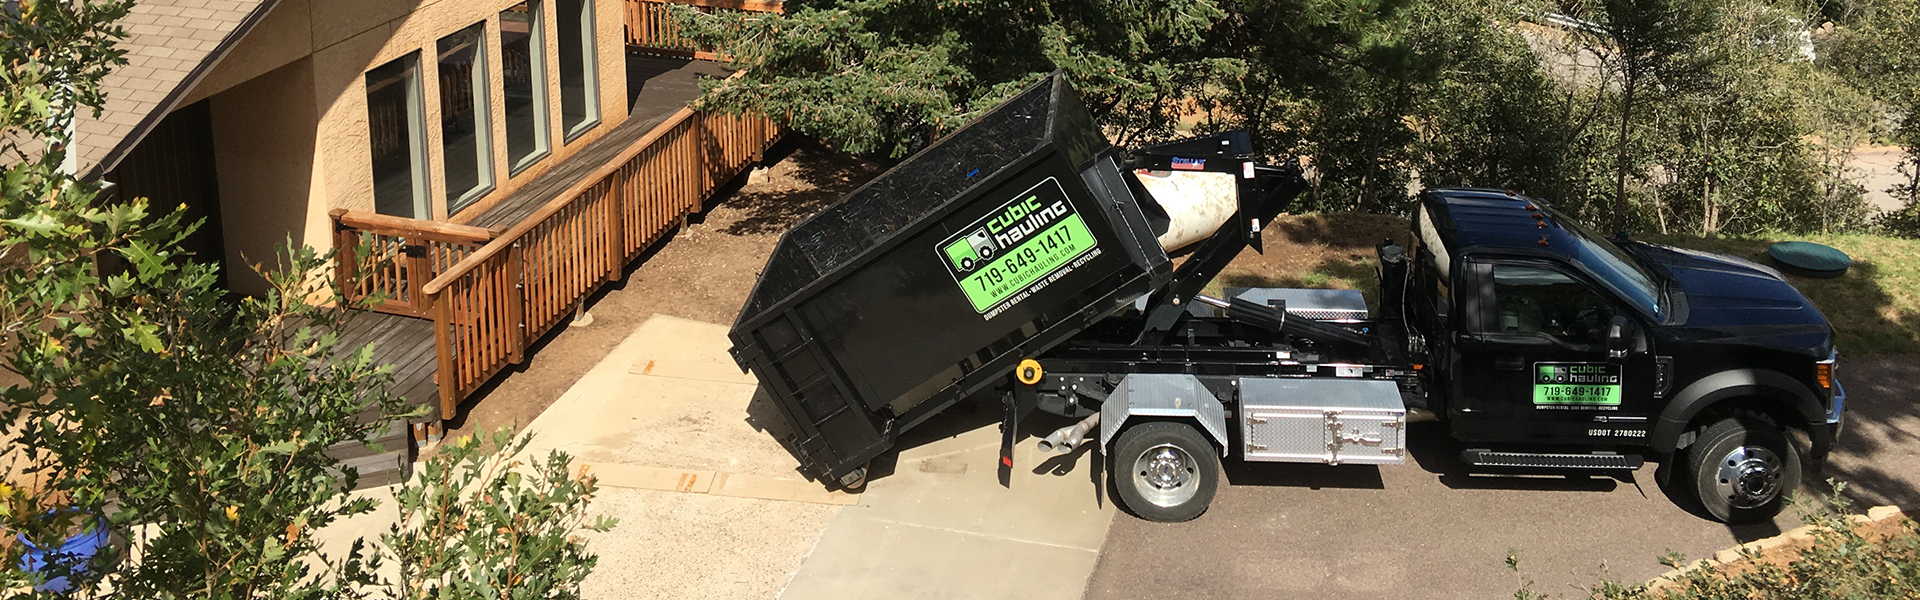 dumpster rental manitou springs